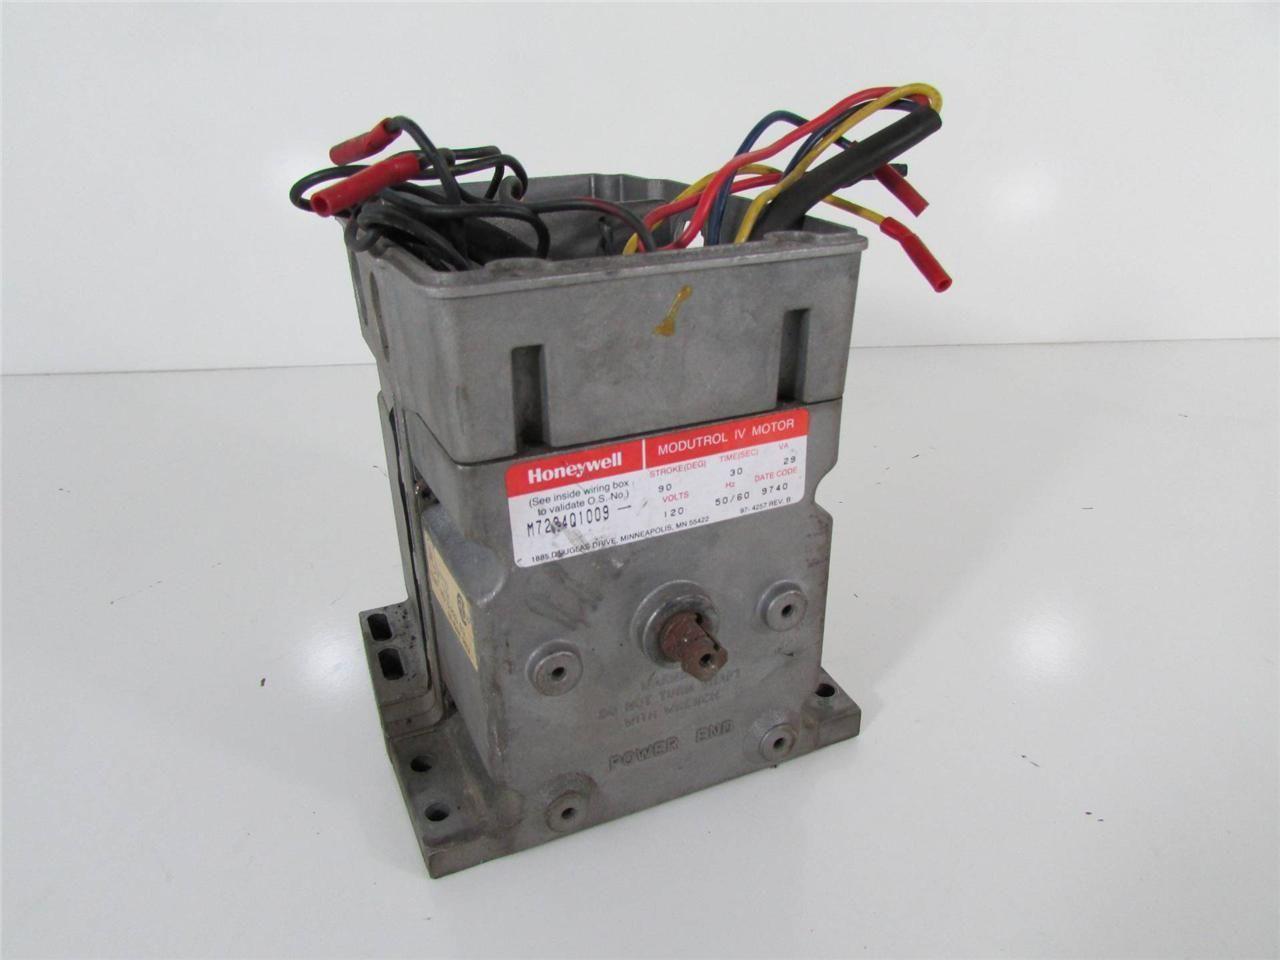 Honeywell Modutrol Iv Motor M7224q1009 Premier Equipment